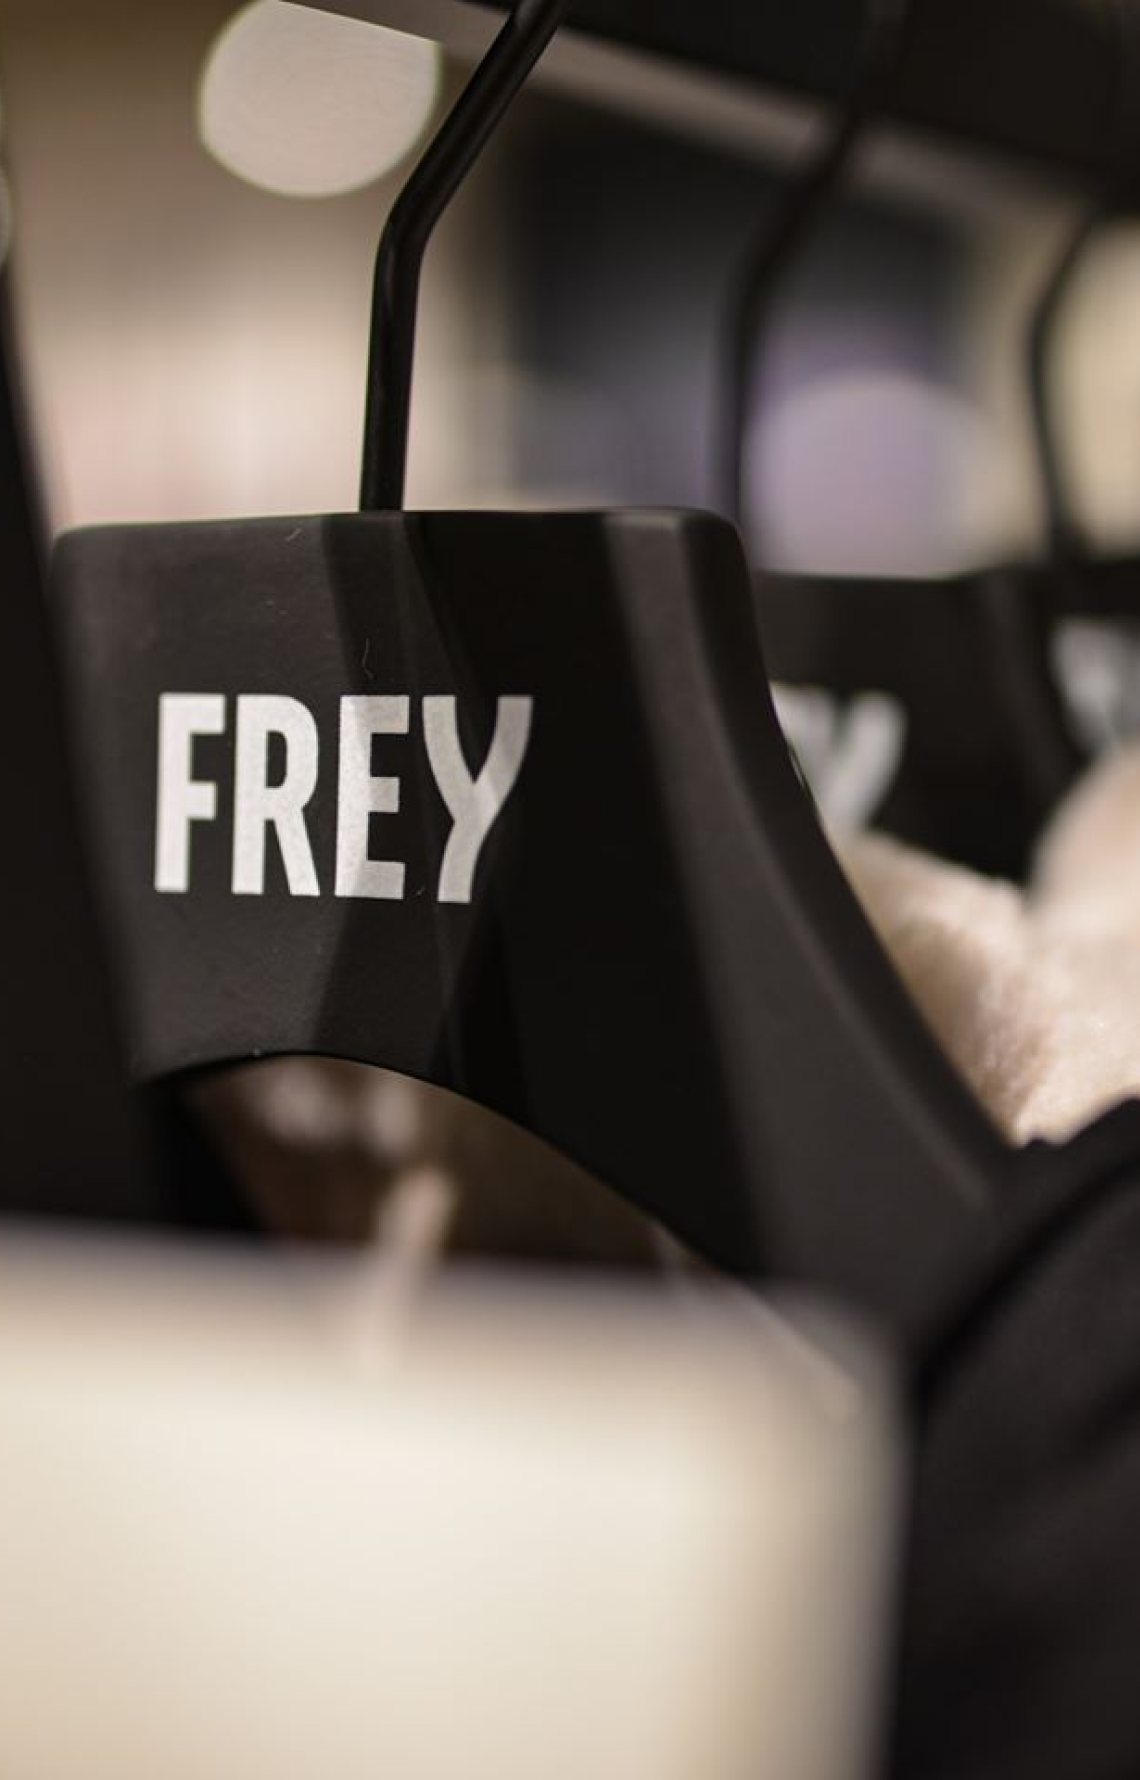 frey-22